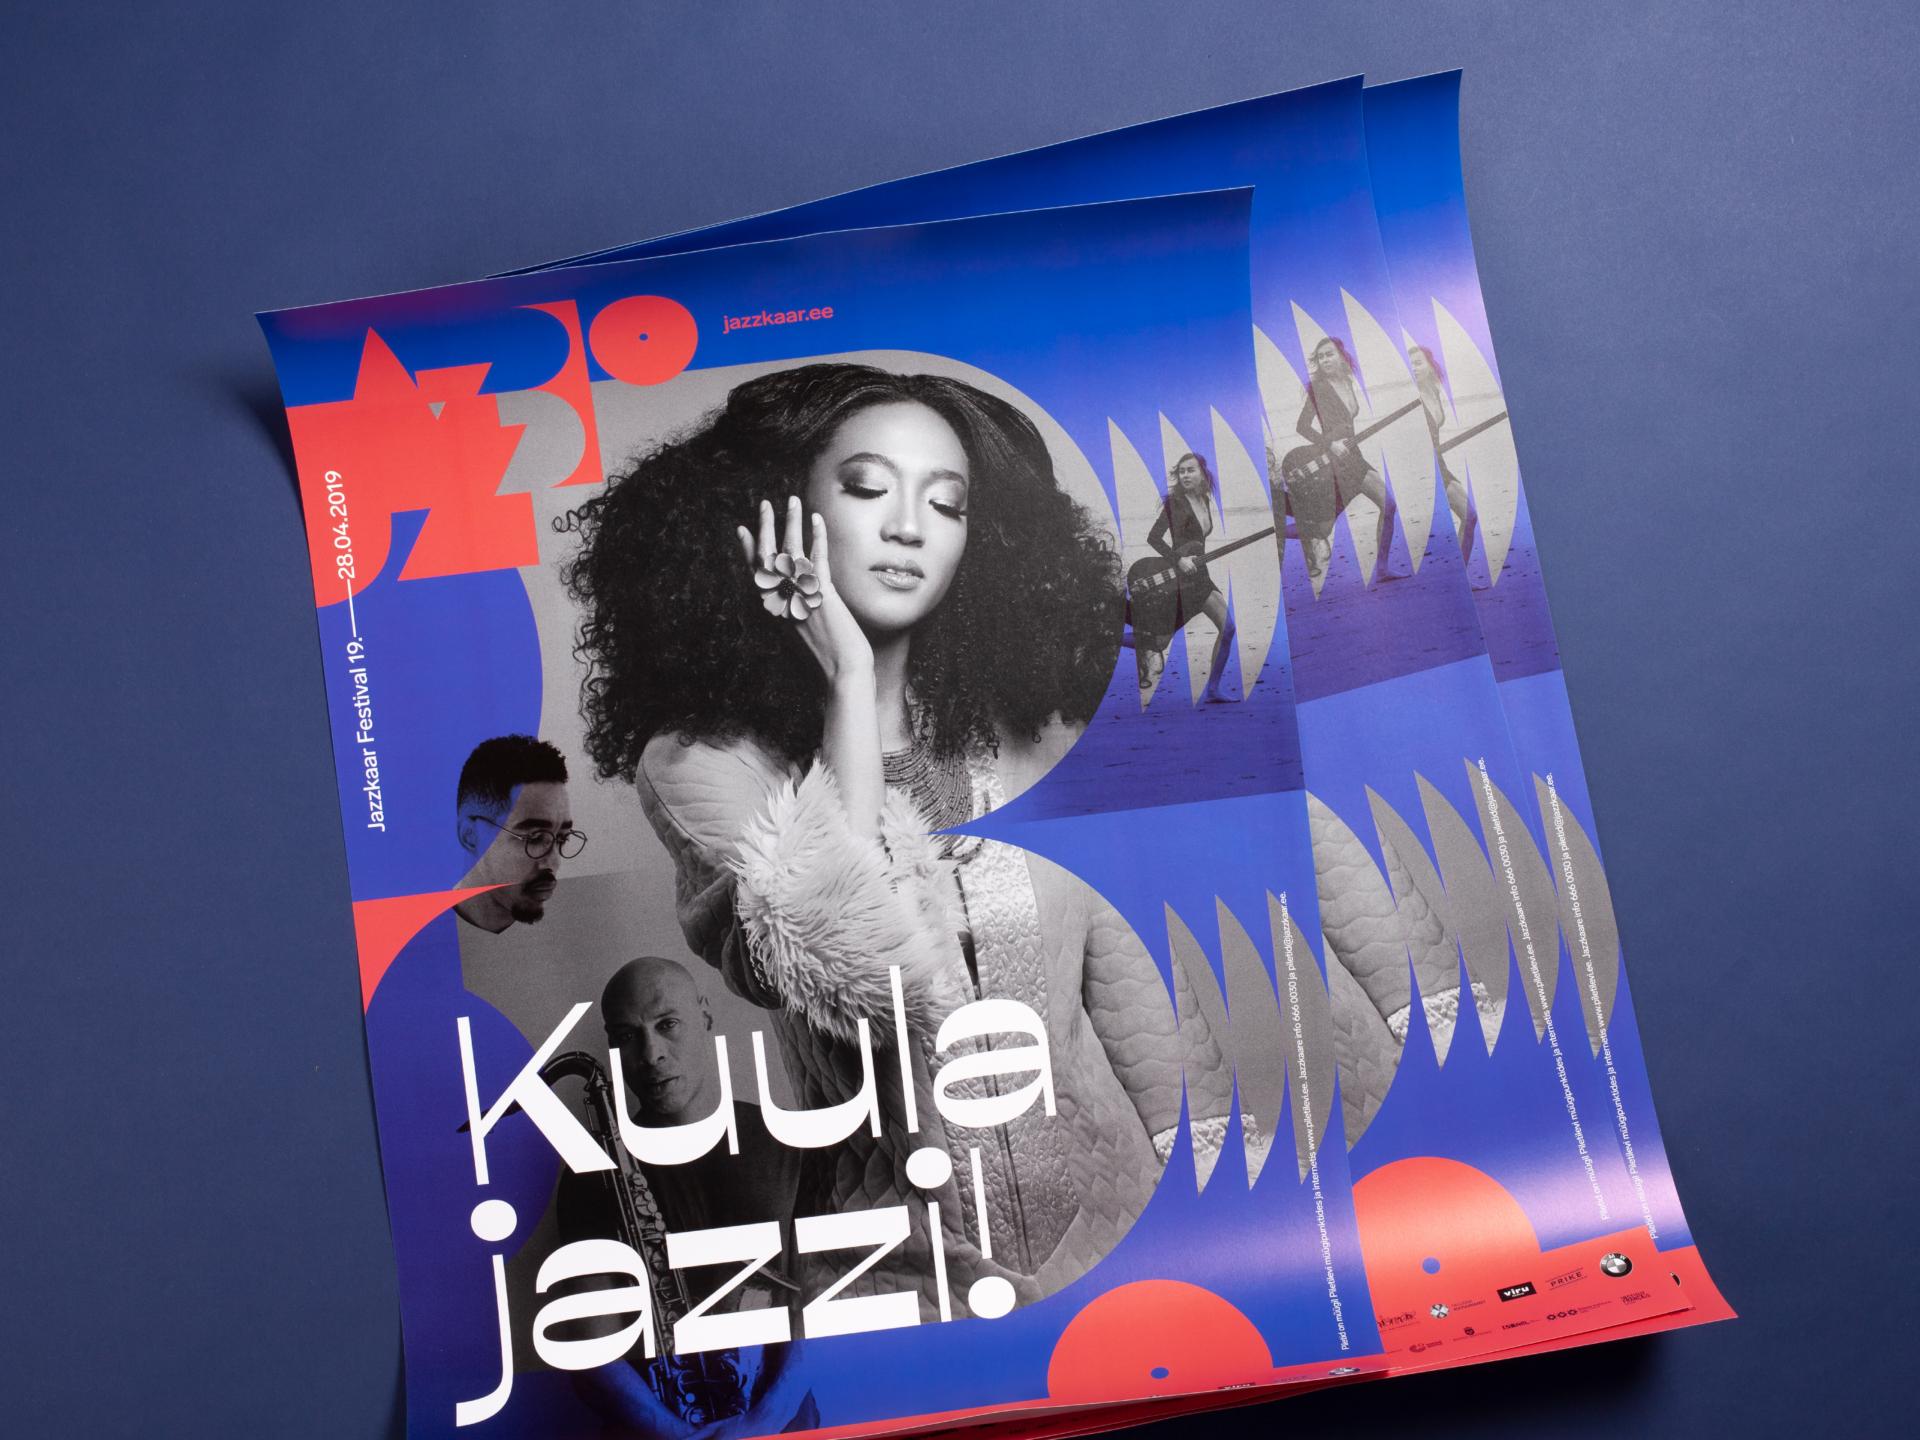 putka Jazzkaar 2019